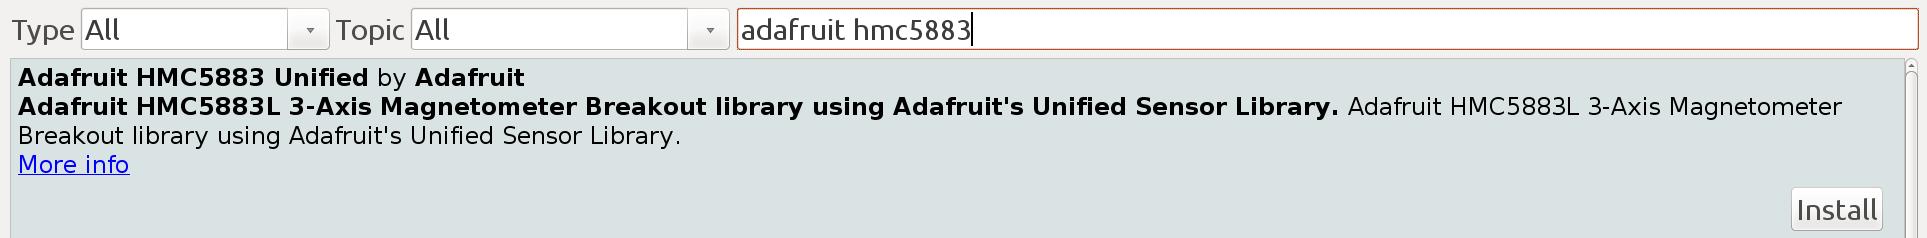 adafruit_products_hmc5883.png